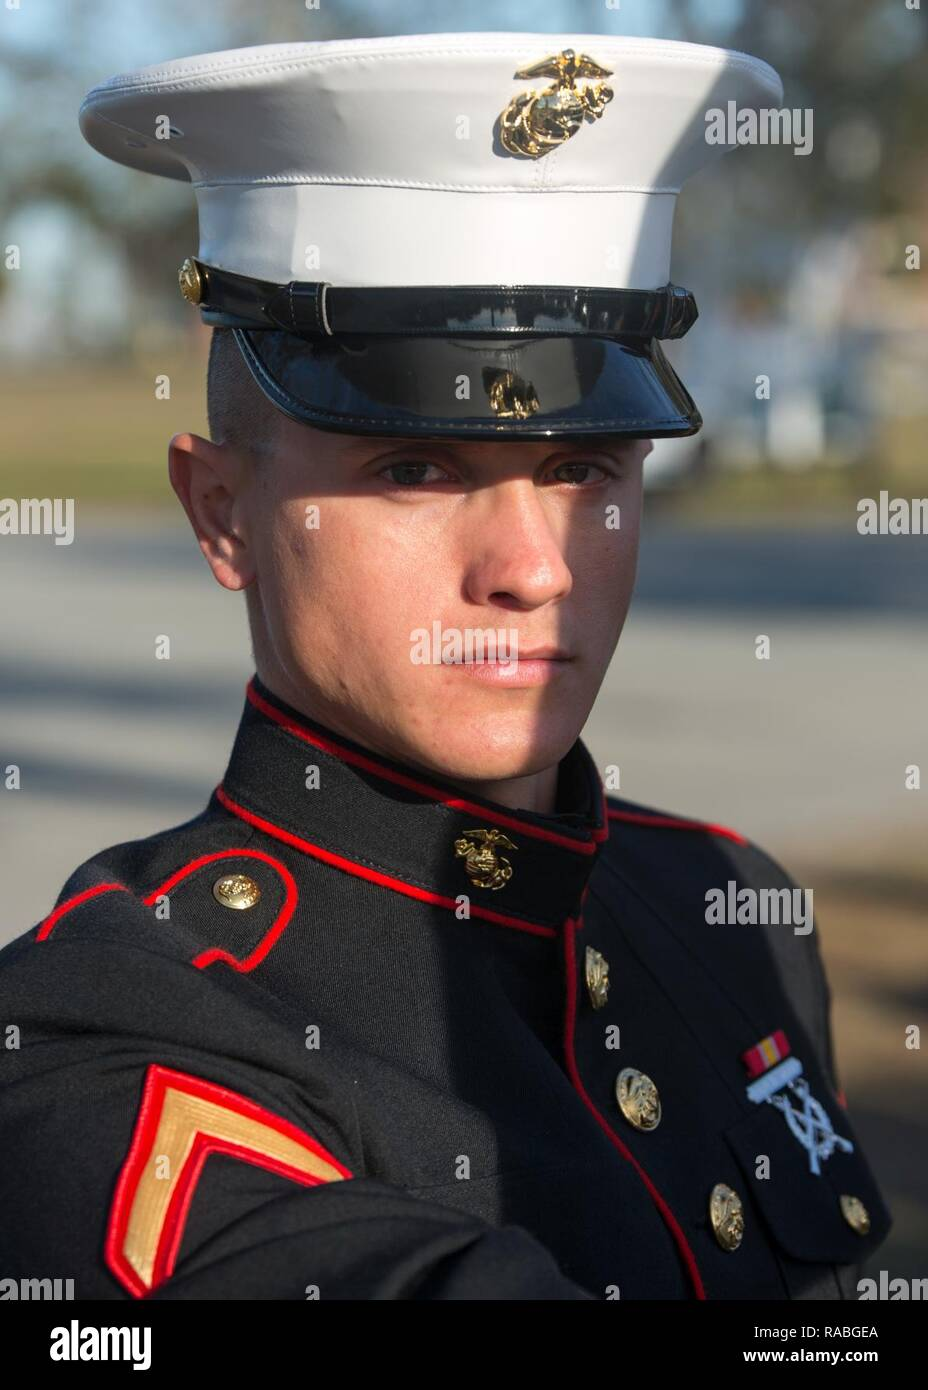 Pfc. Dustin T. Jordan, honor graduate for Platoon 1000, Charlie Company, 1st Recruit Training Battalion, graduated boot camp Jan. 27, 2017. Jordan is from Manchester, Ga. - Stock Image